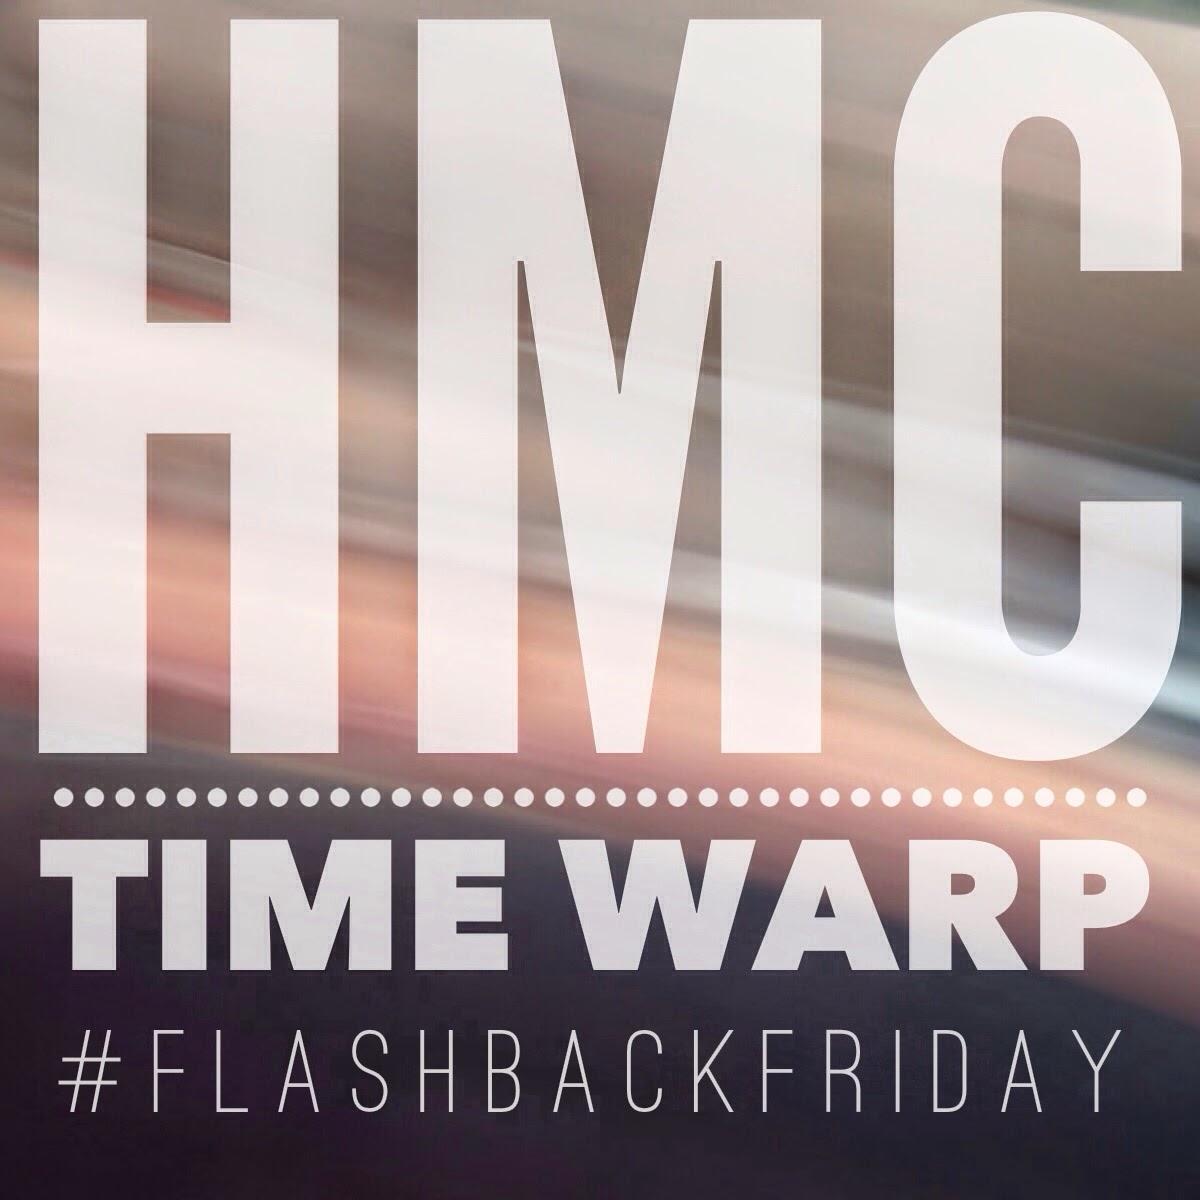 flash back friday, hanover missionary church